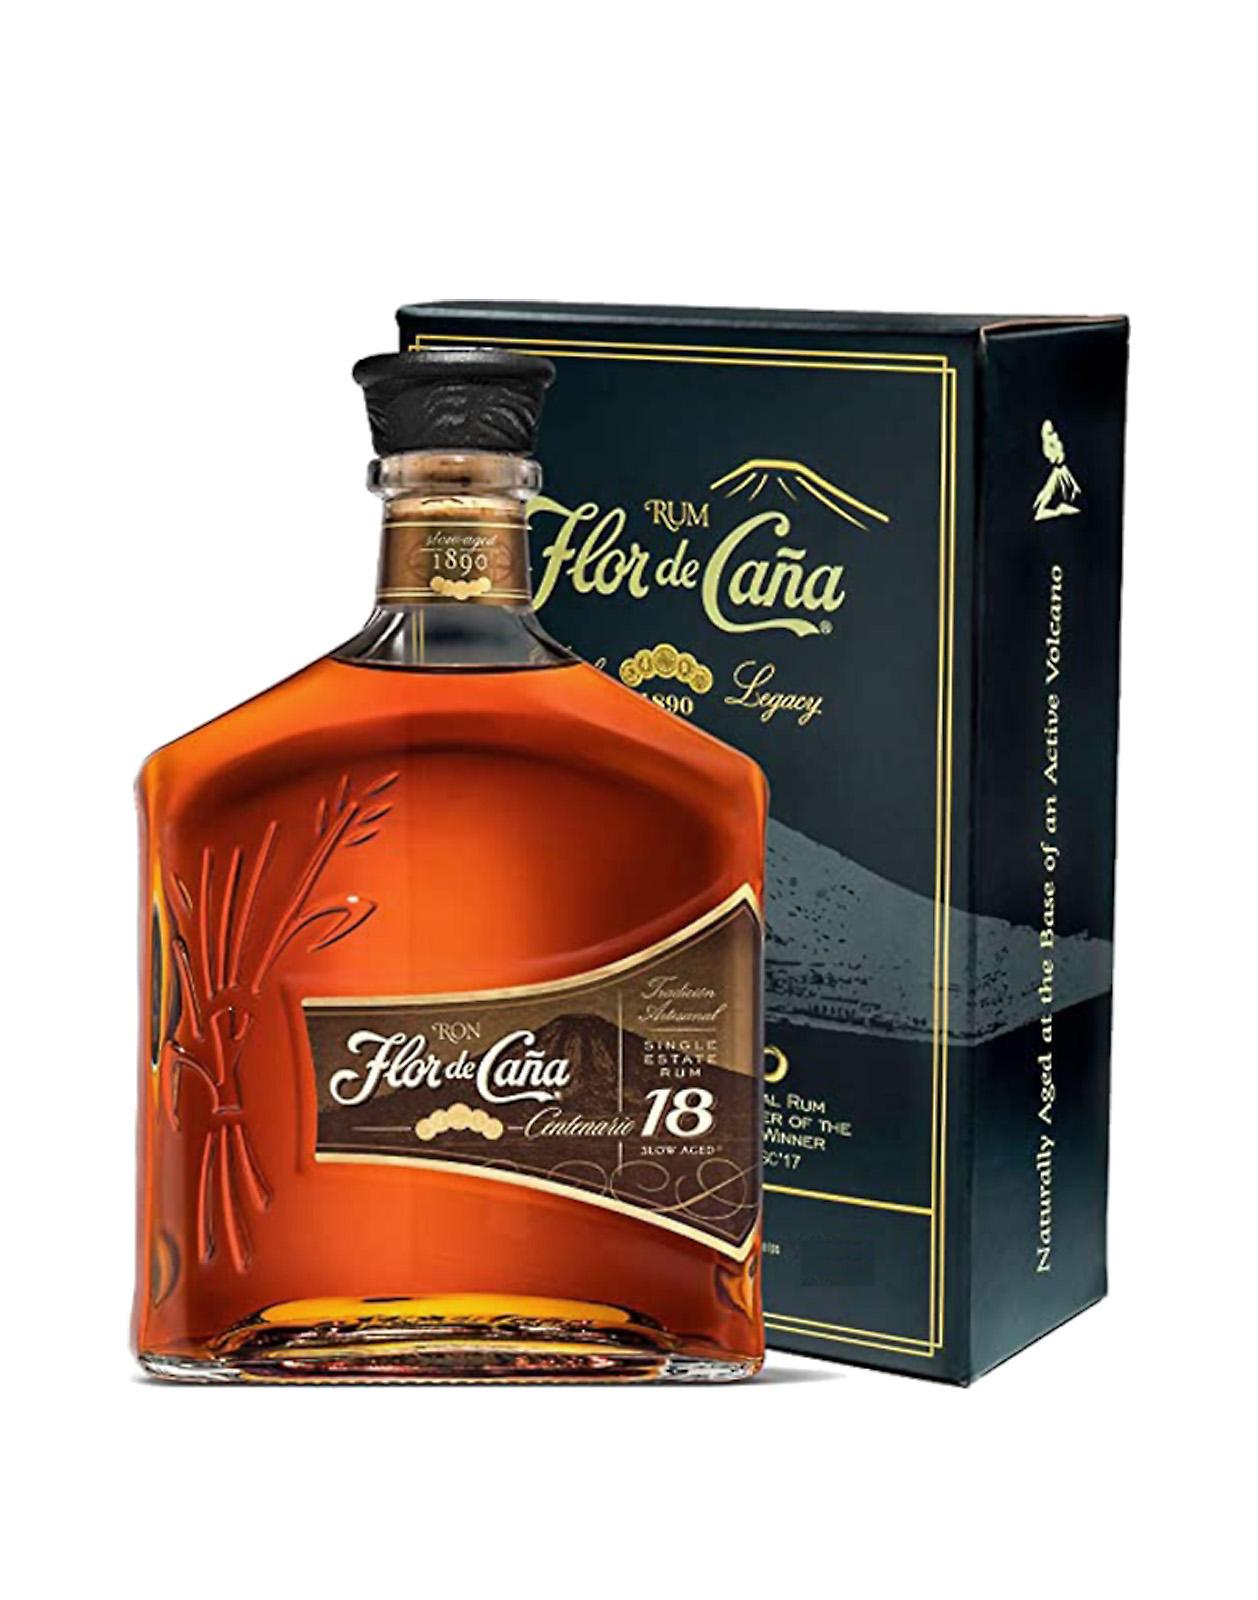 Flor de Cana Centario 18Y v kartóne 1L 40% rum, Bottleshop Sunny wines slnecnice mesto, petrzalka, rum, rozvoz alkoholu, eshop